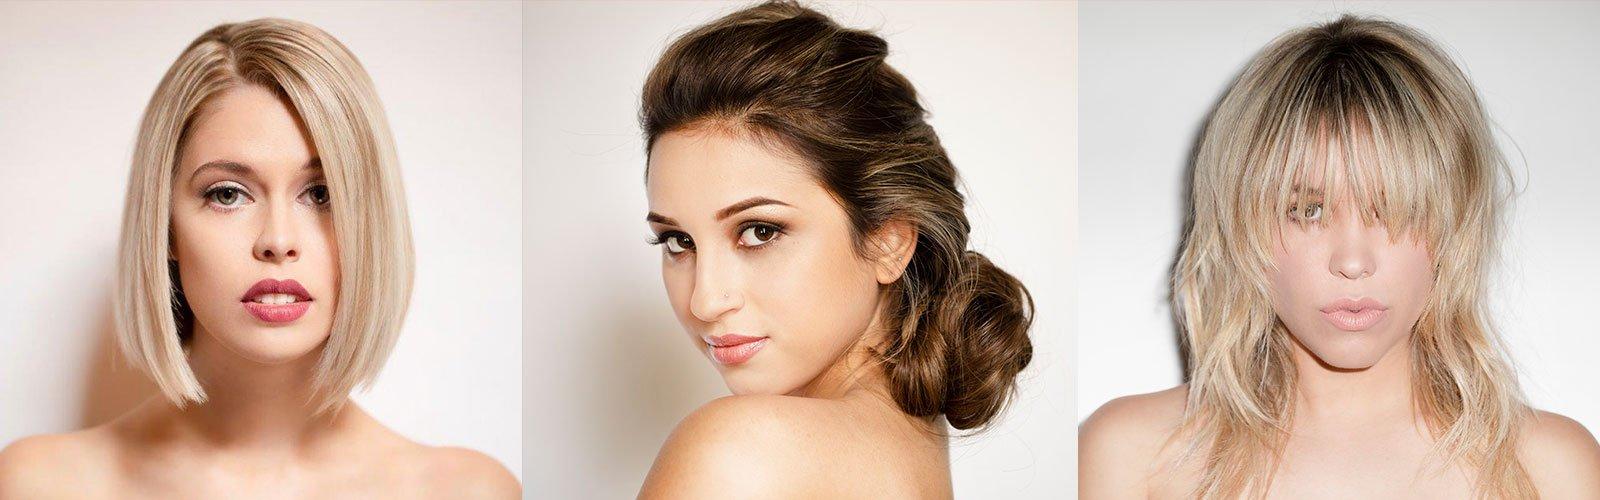 Beauty Salon In Arlington Tx 76017 Daireds Salon Spa Pangea